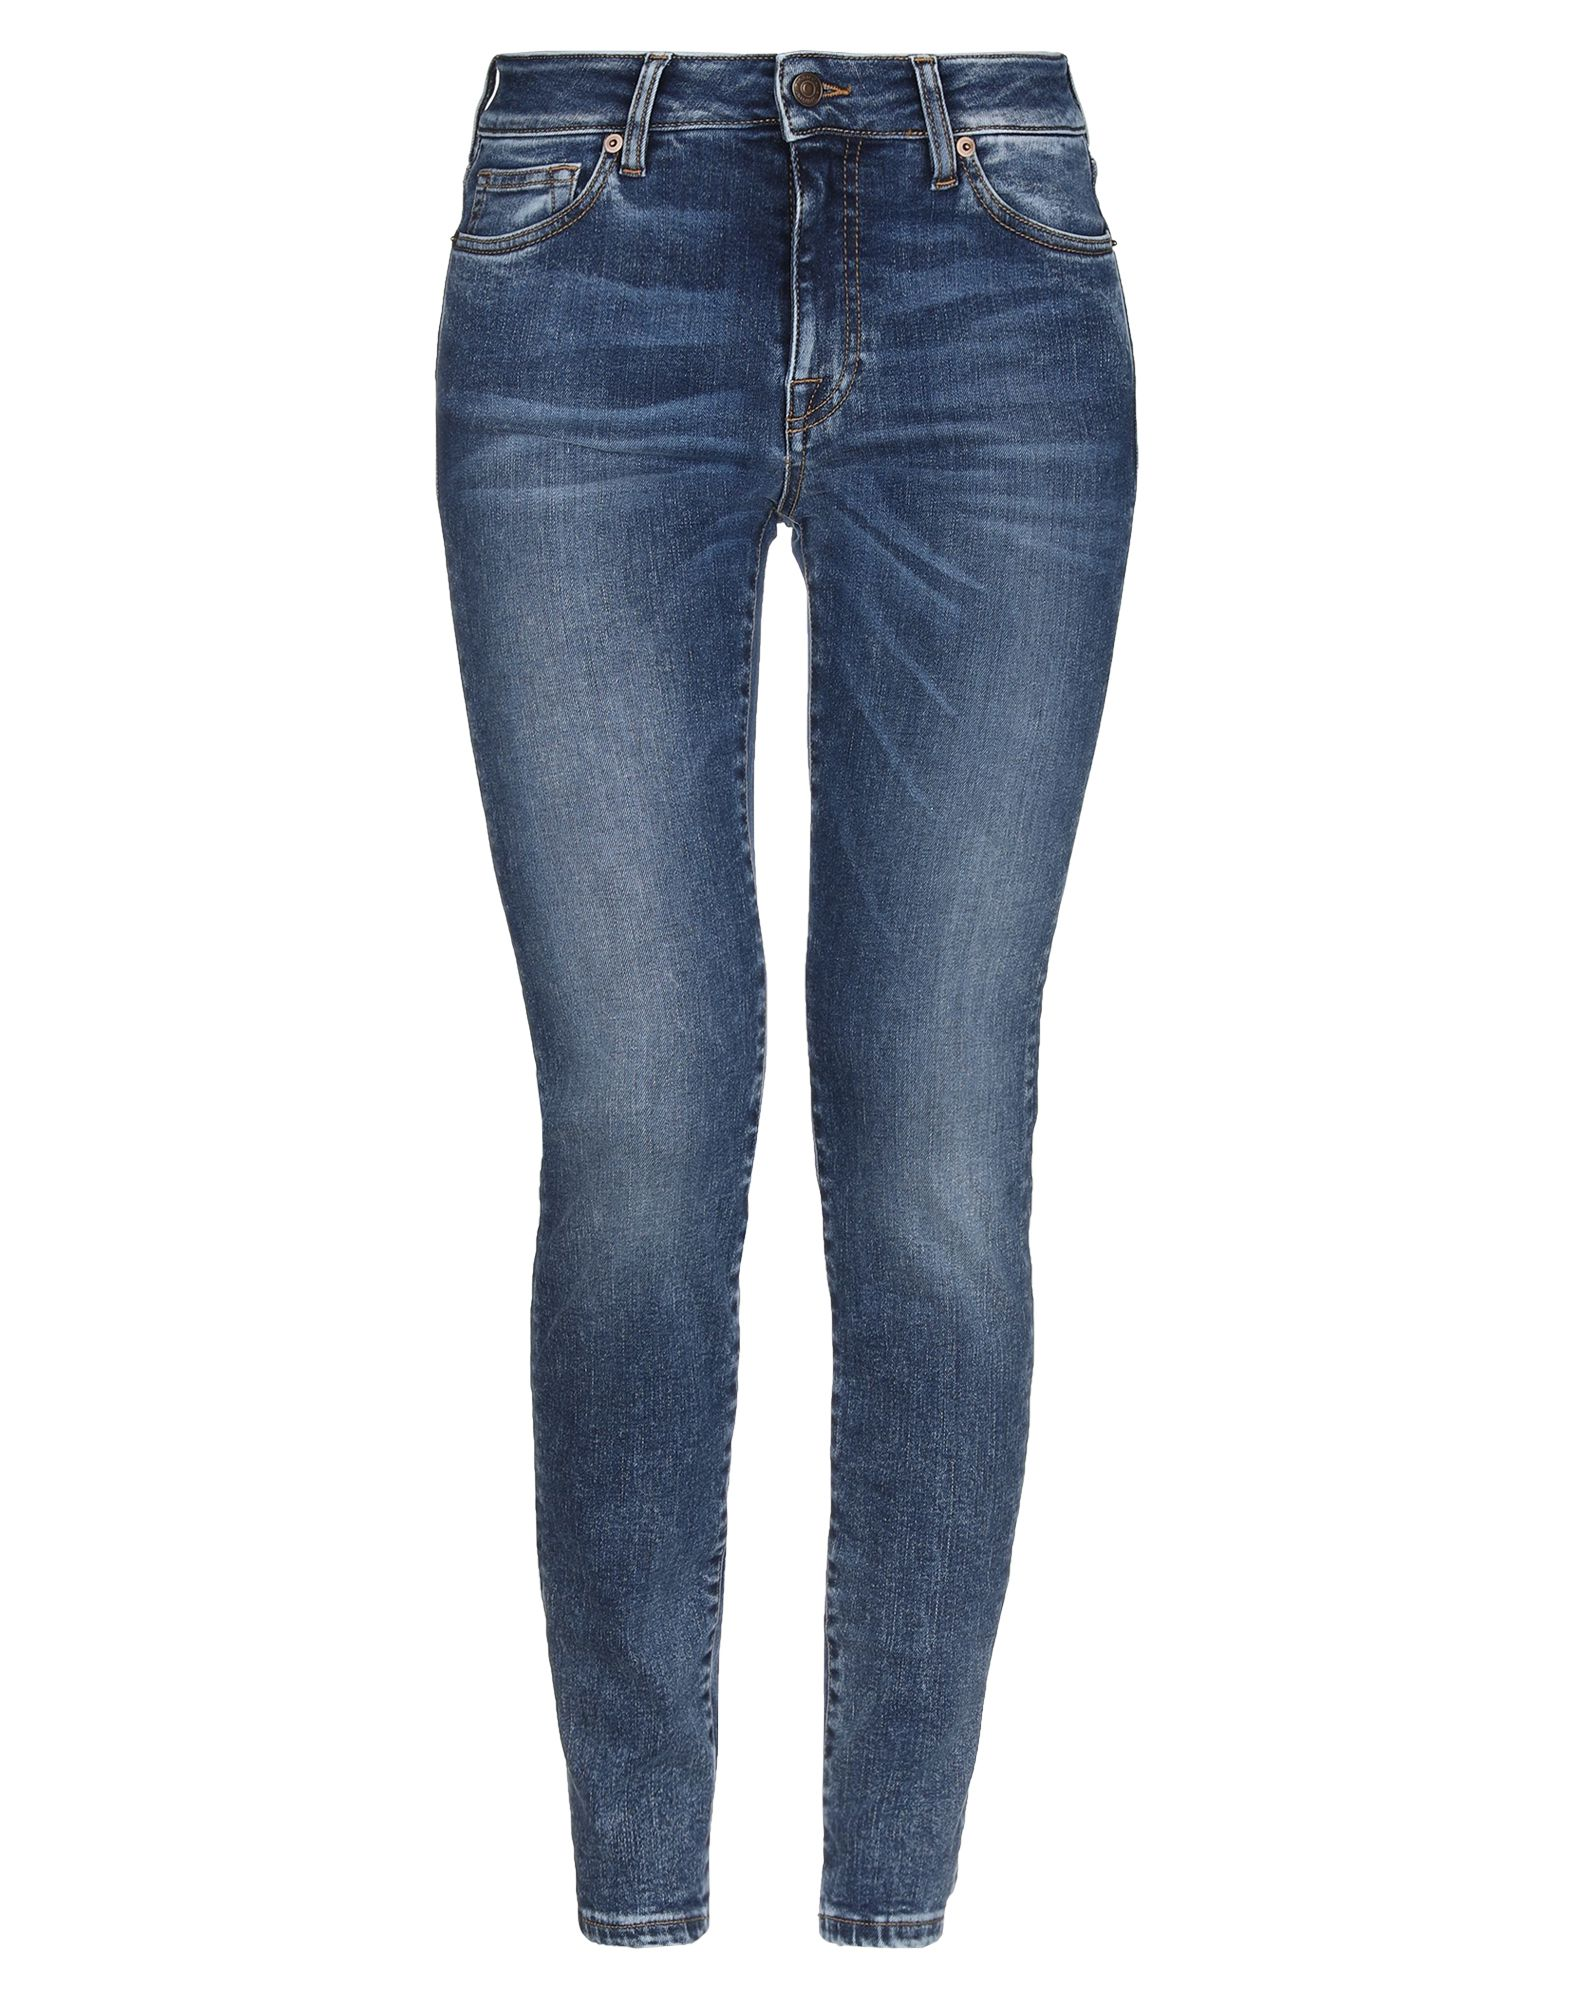 MAURO GRIFONI Джинсовые брюки бра с подсветкой mantra bahia 5233 5238